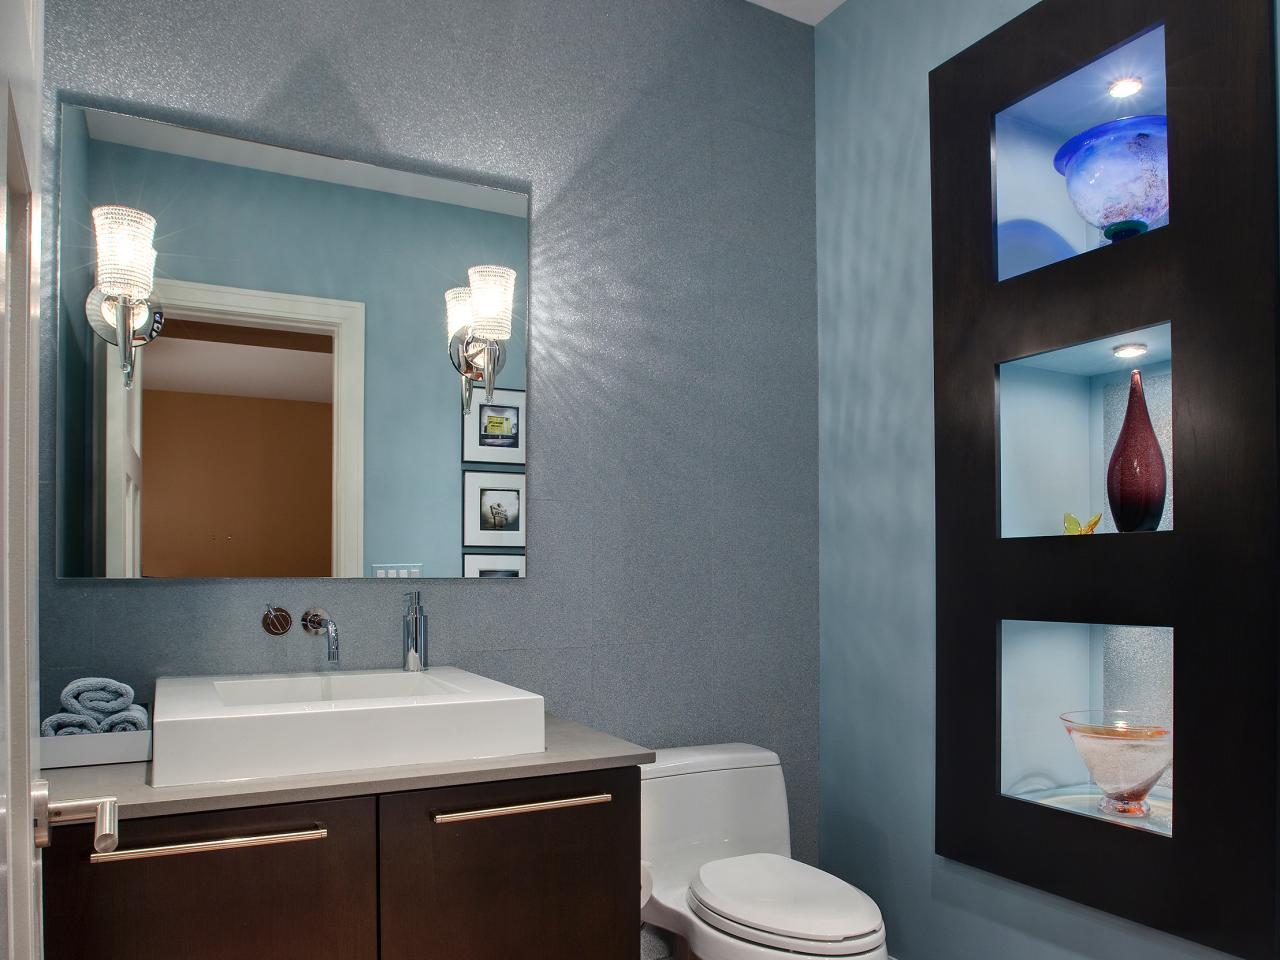 attic remodeling tips and ideas - Half Bathroom or Powder Room